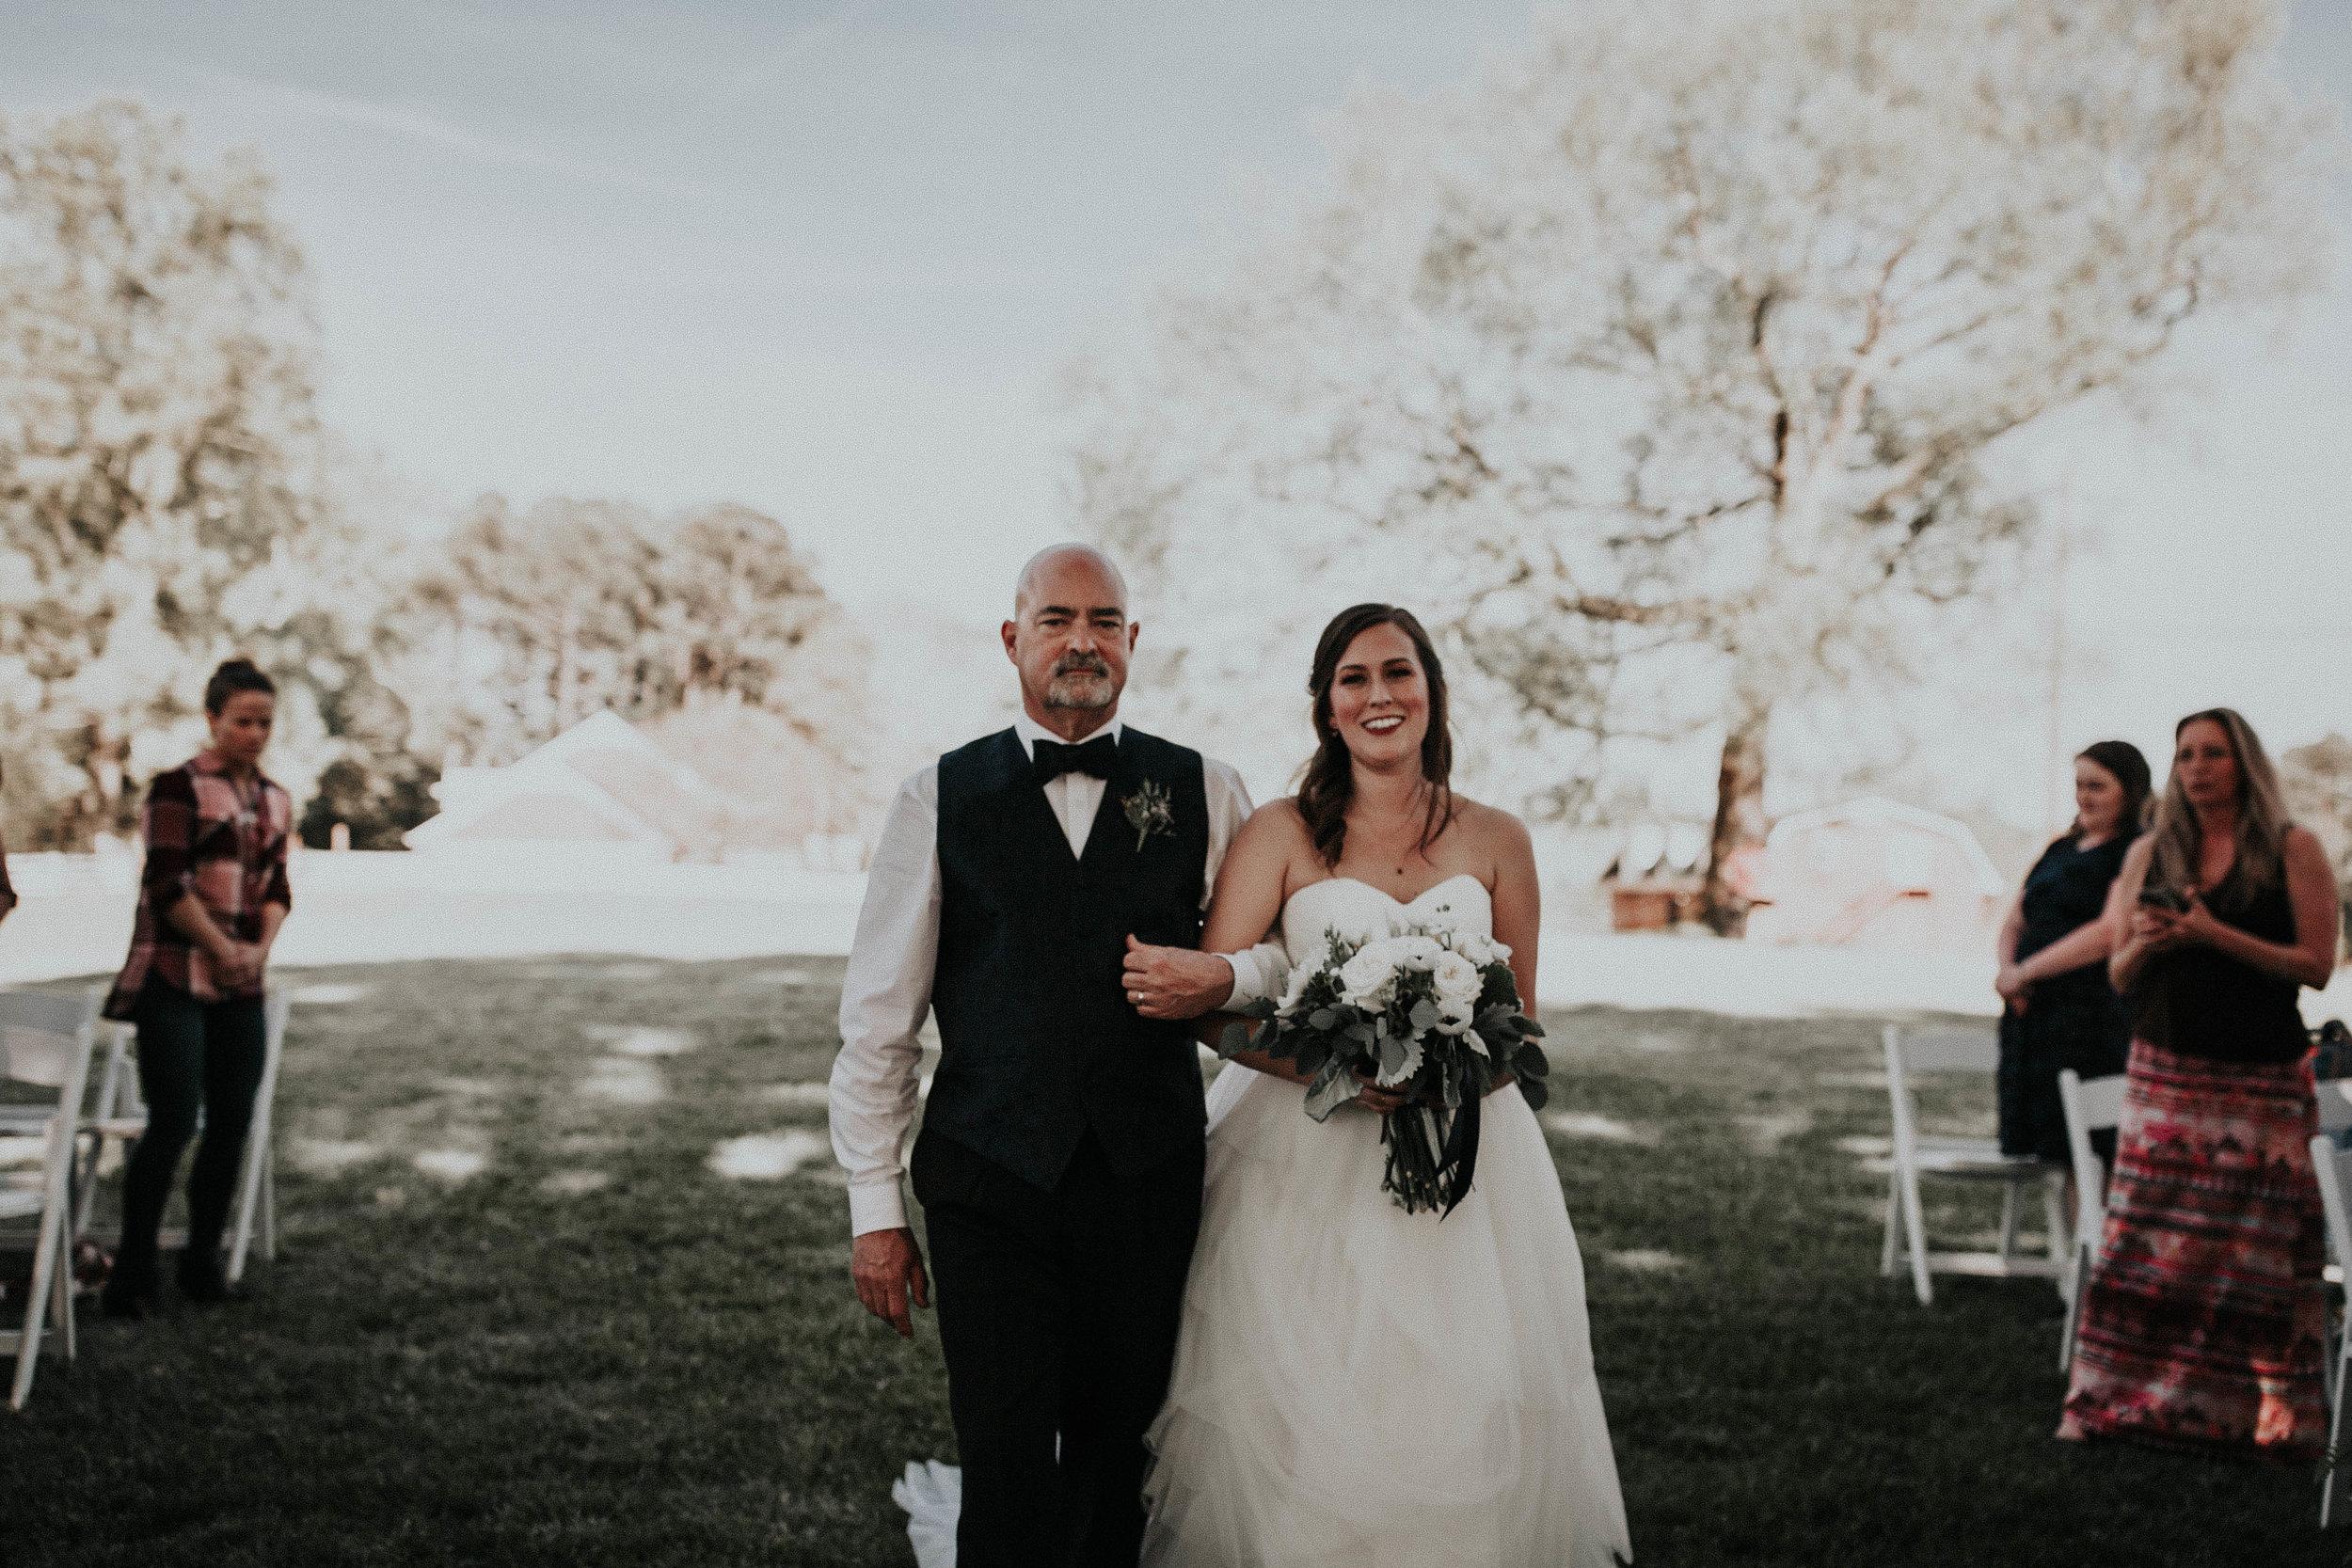 Adam_and_Hannah_Wedding_CharisLauren__5420.jpg